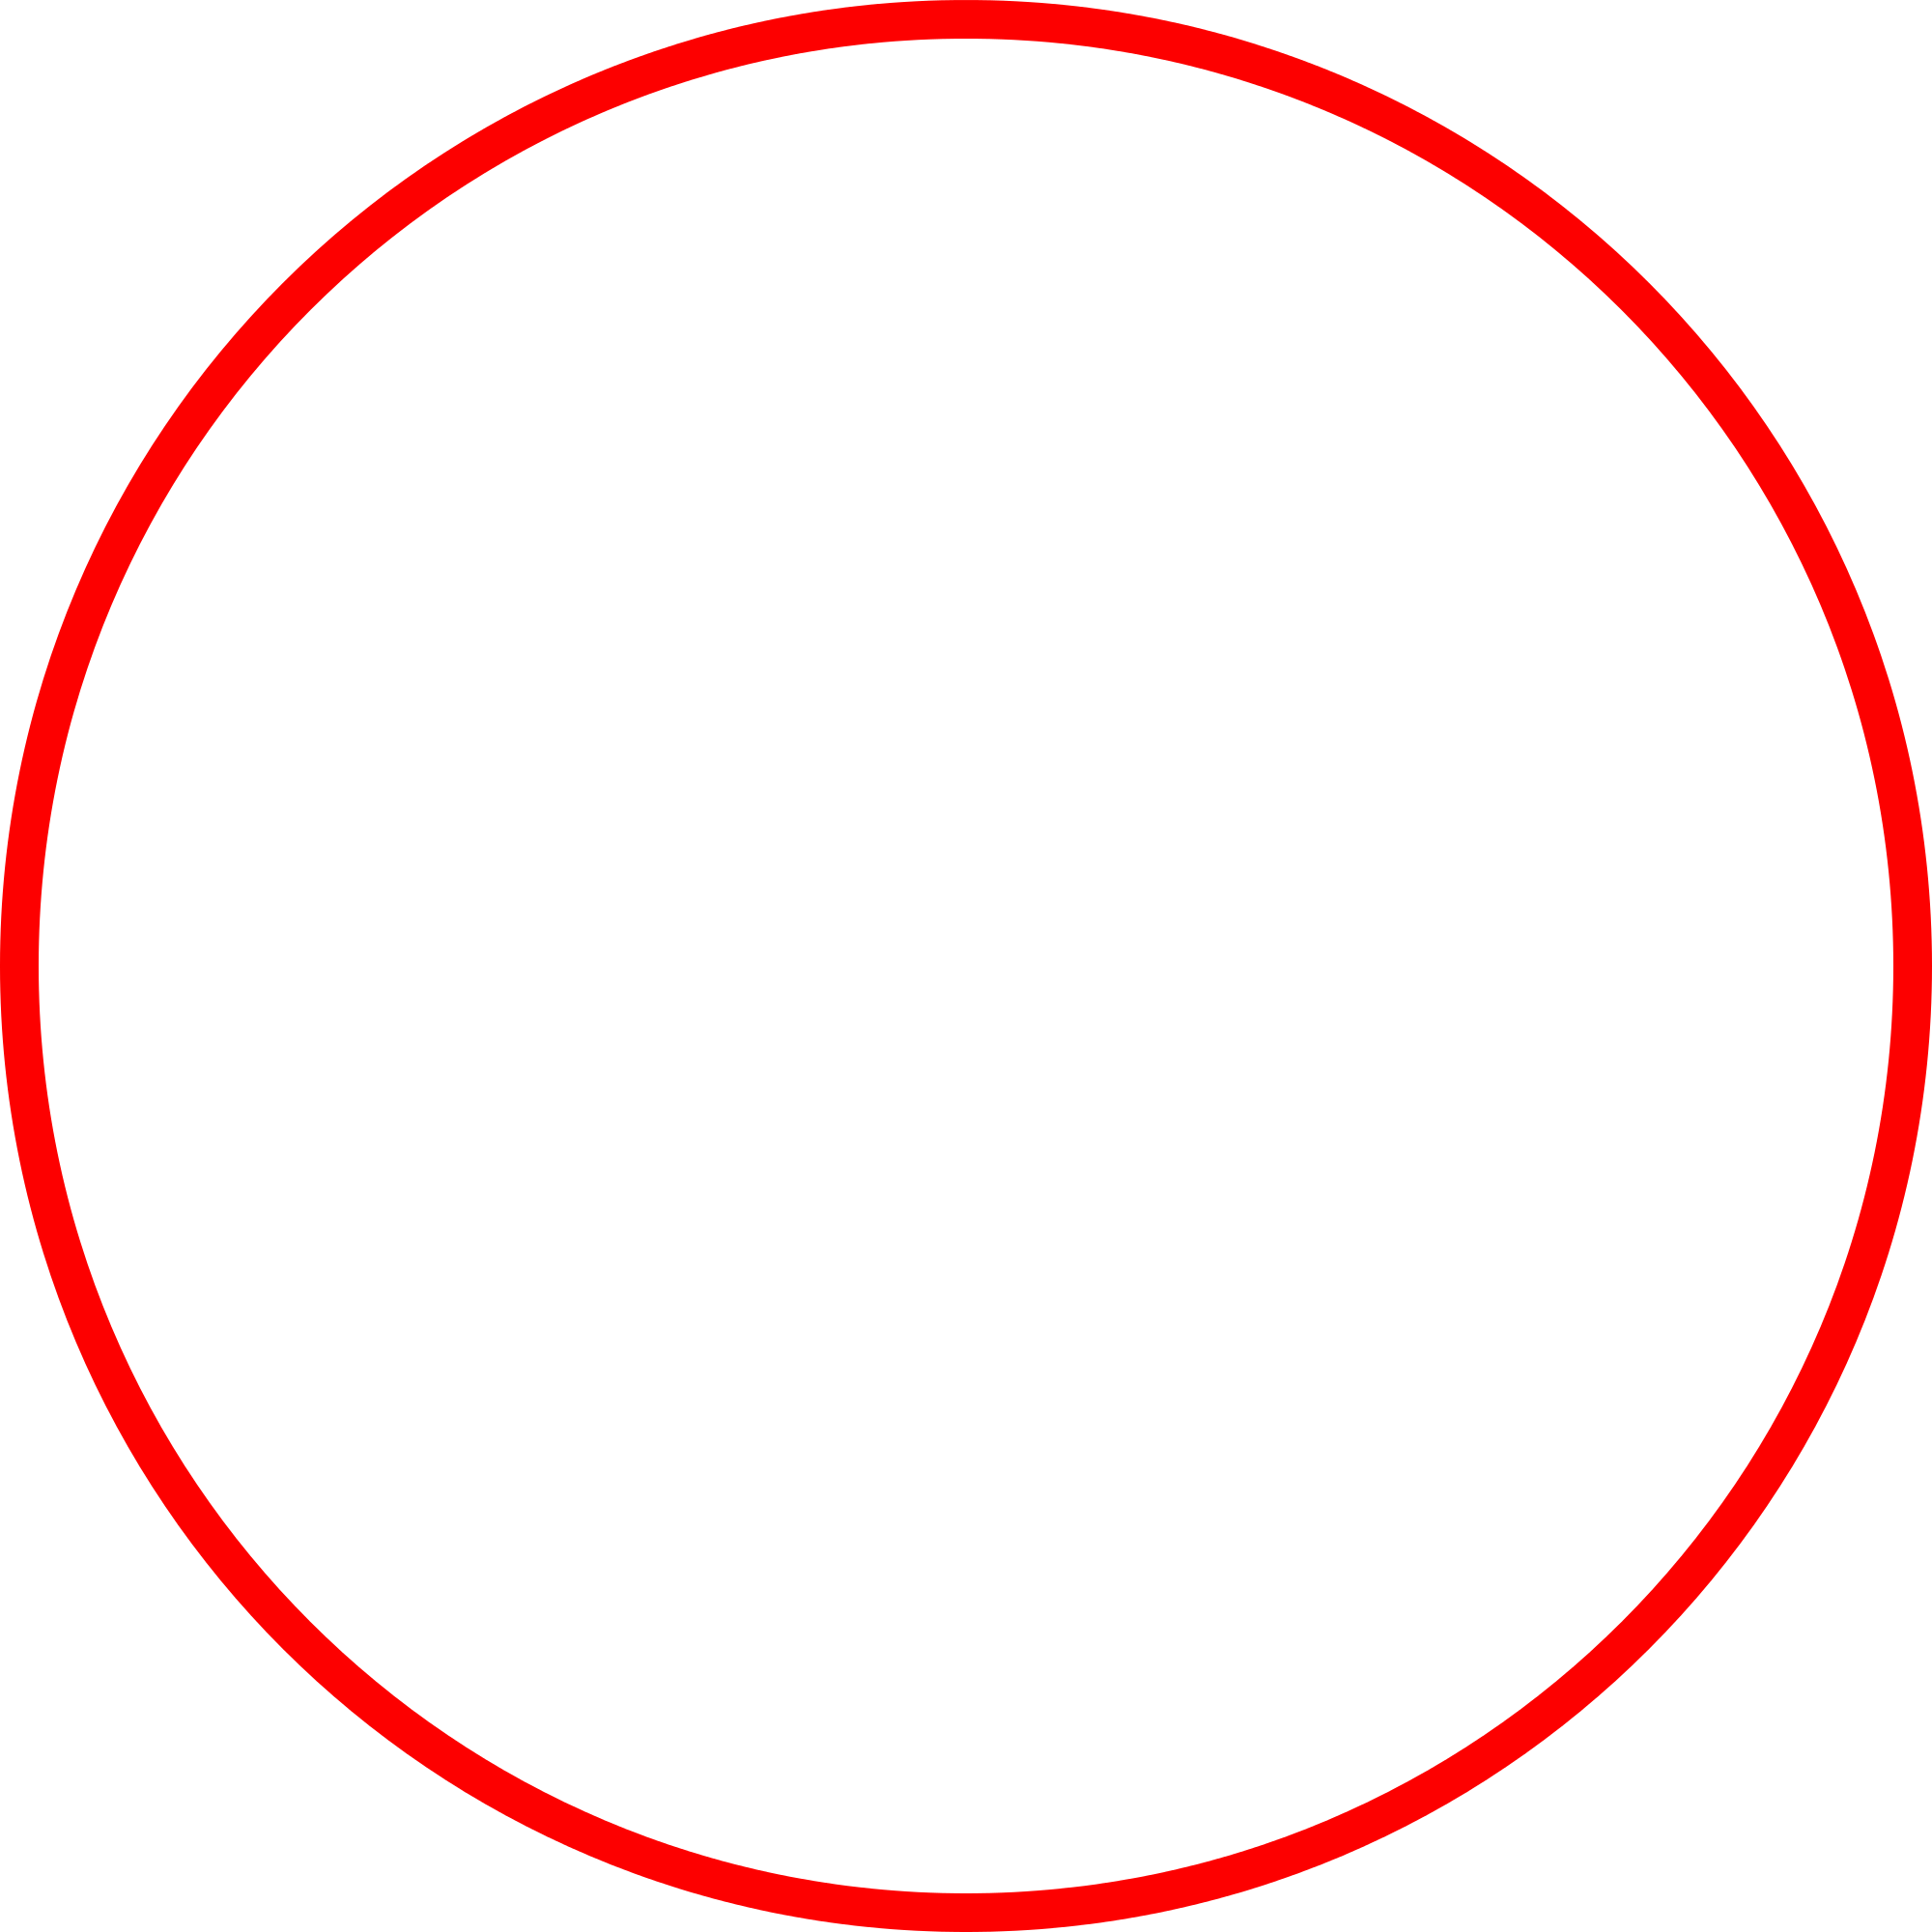 Circle Shape PNG HD - 142124